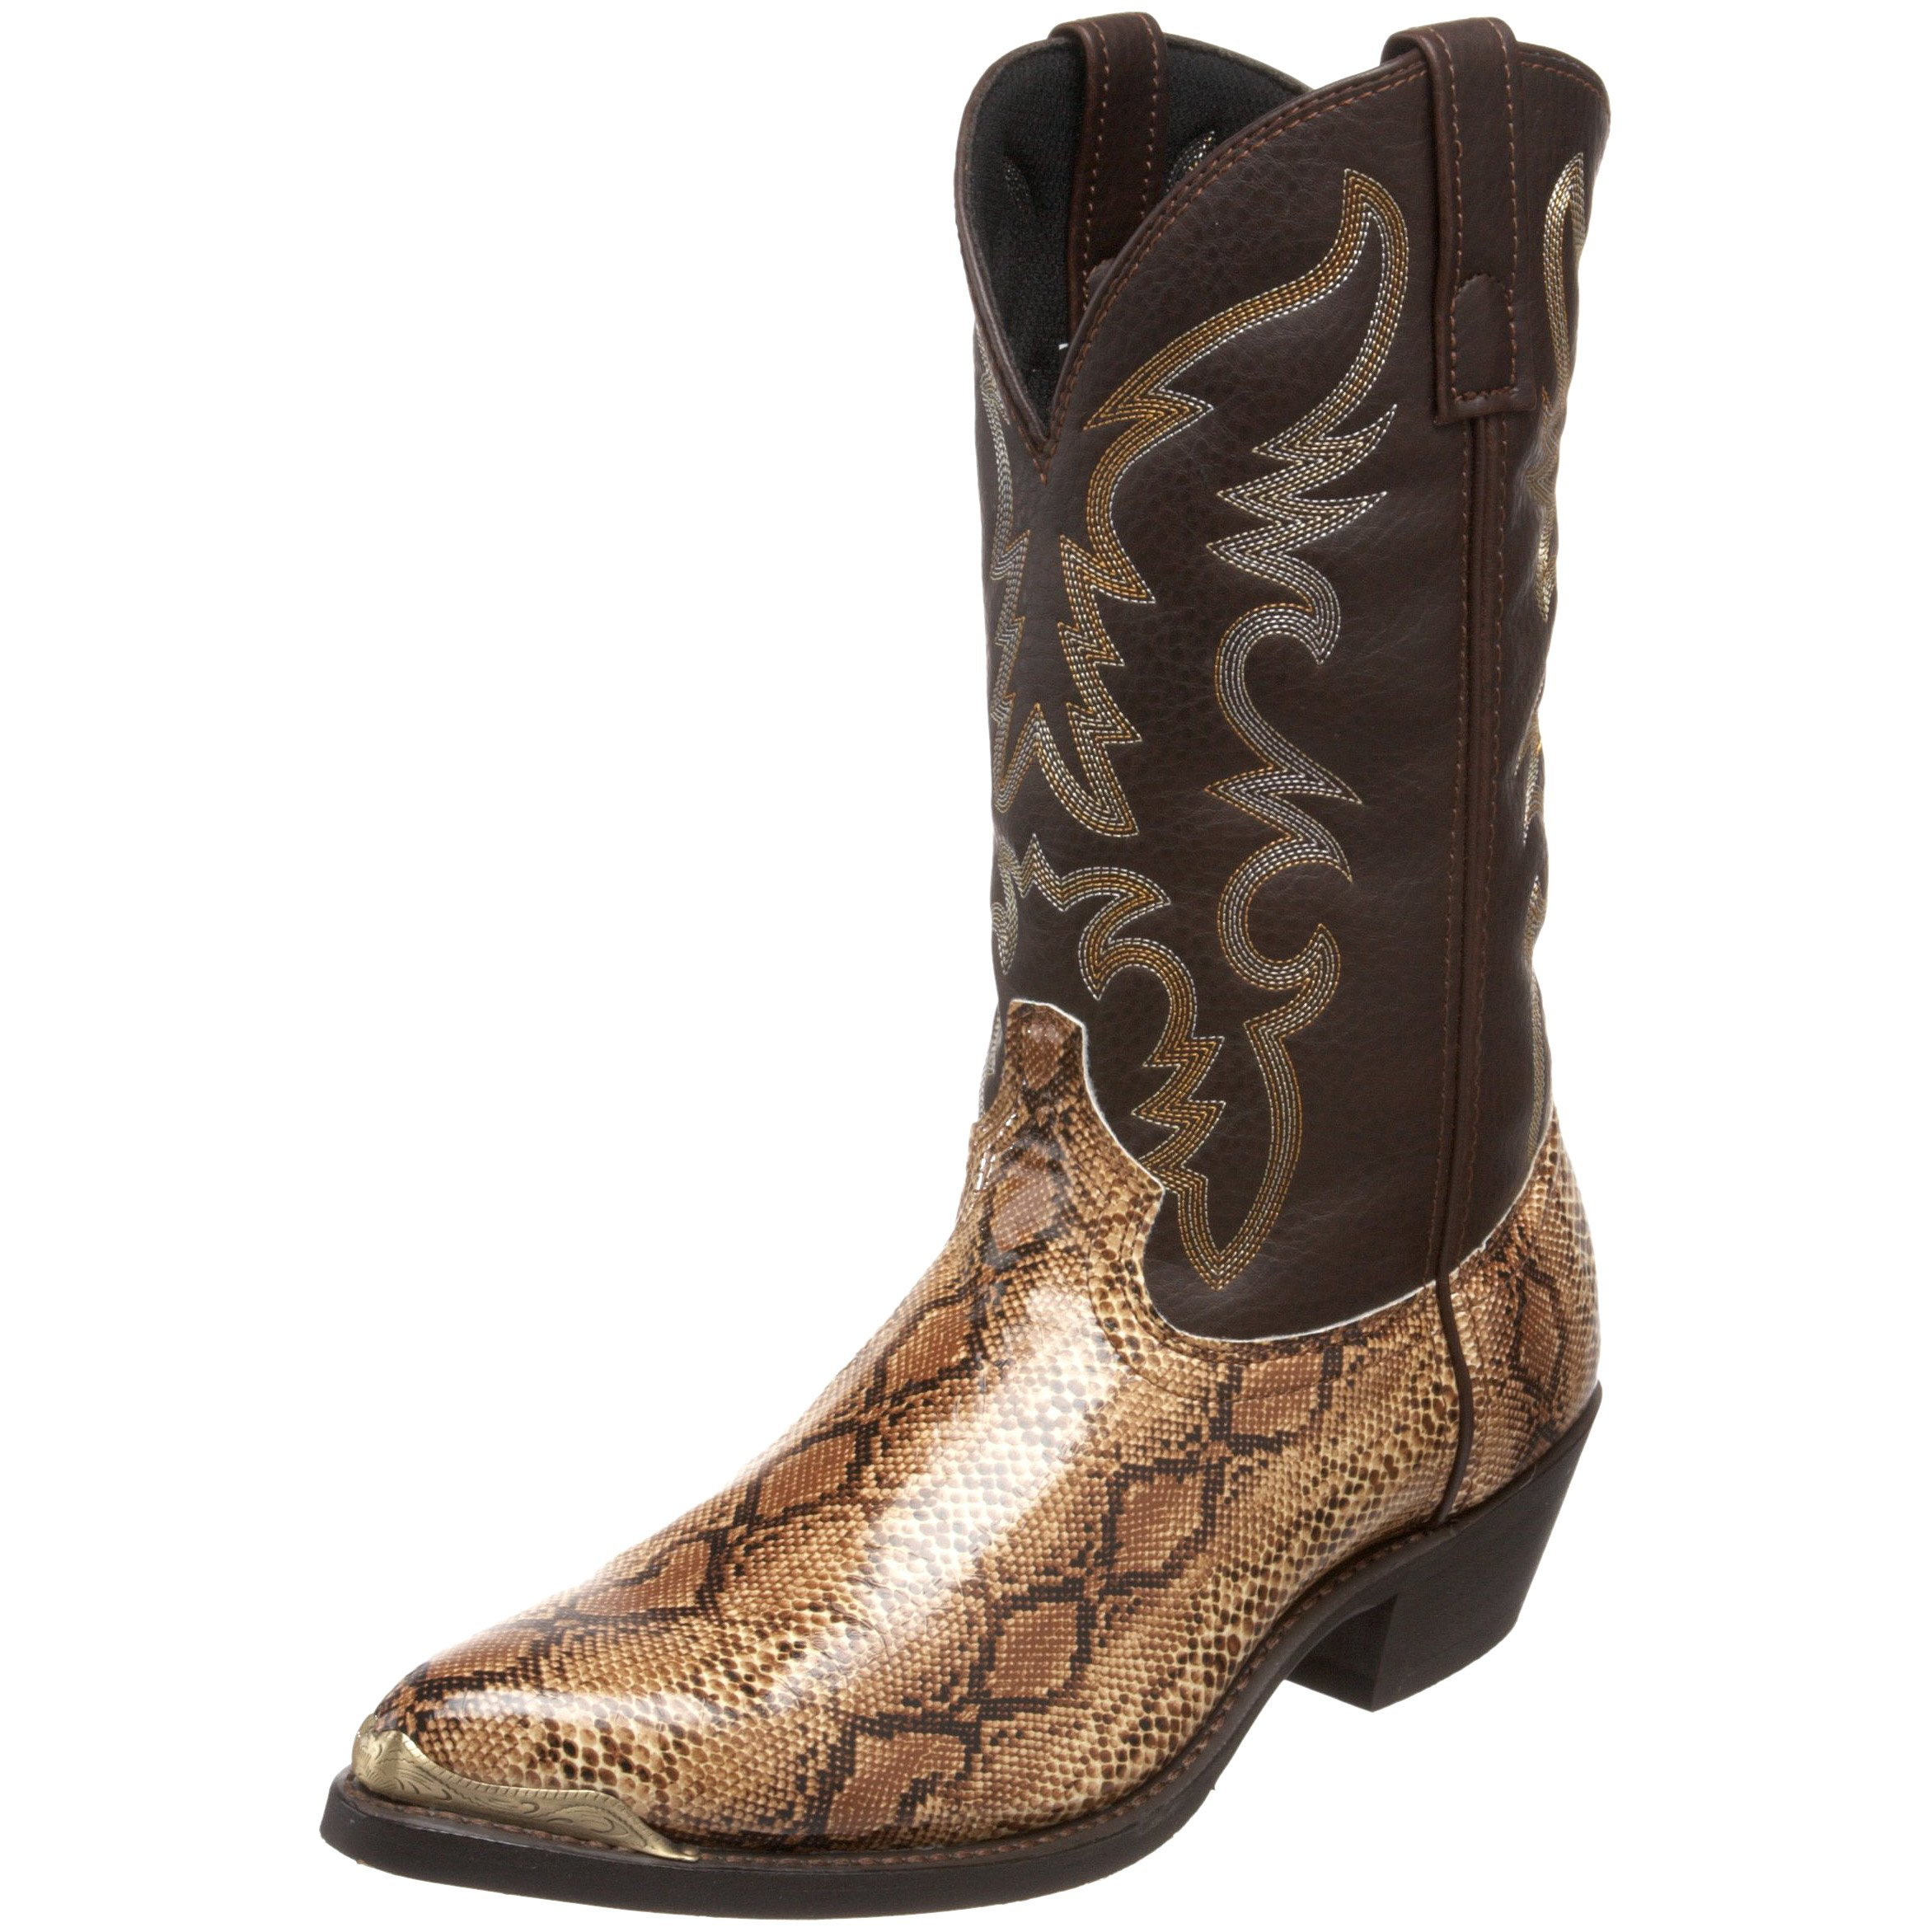 Laredo Men's 68068 Monty Western Boot,Brown/Copper,10 D US